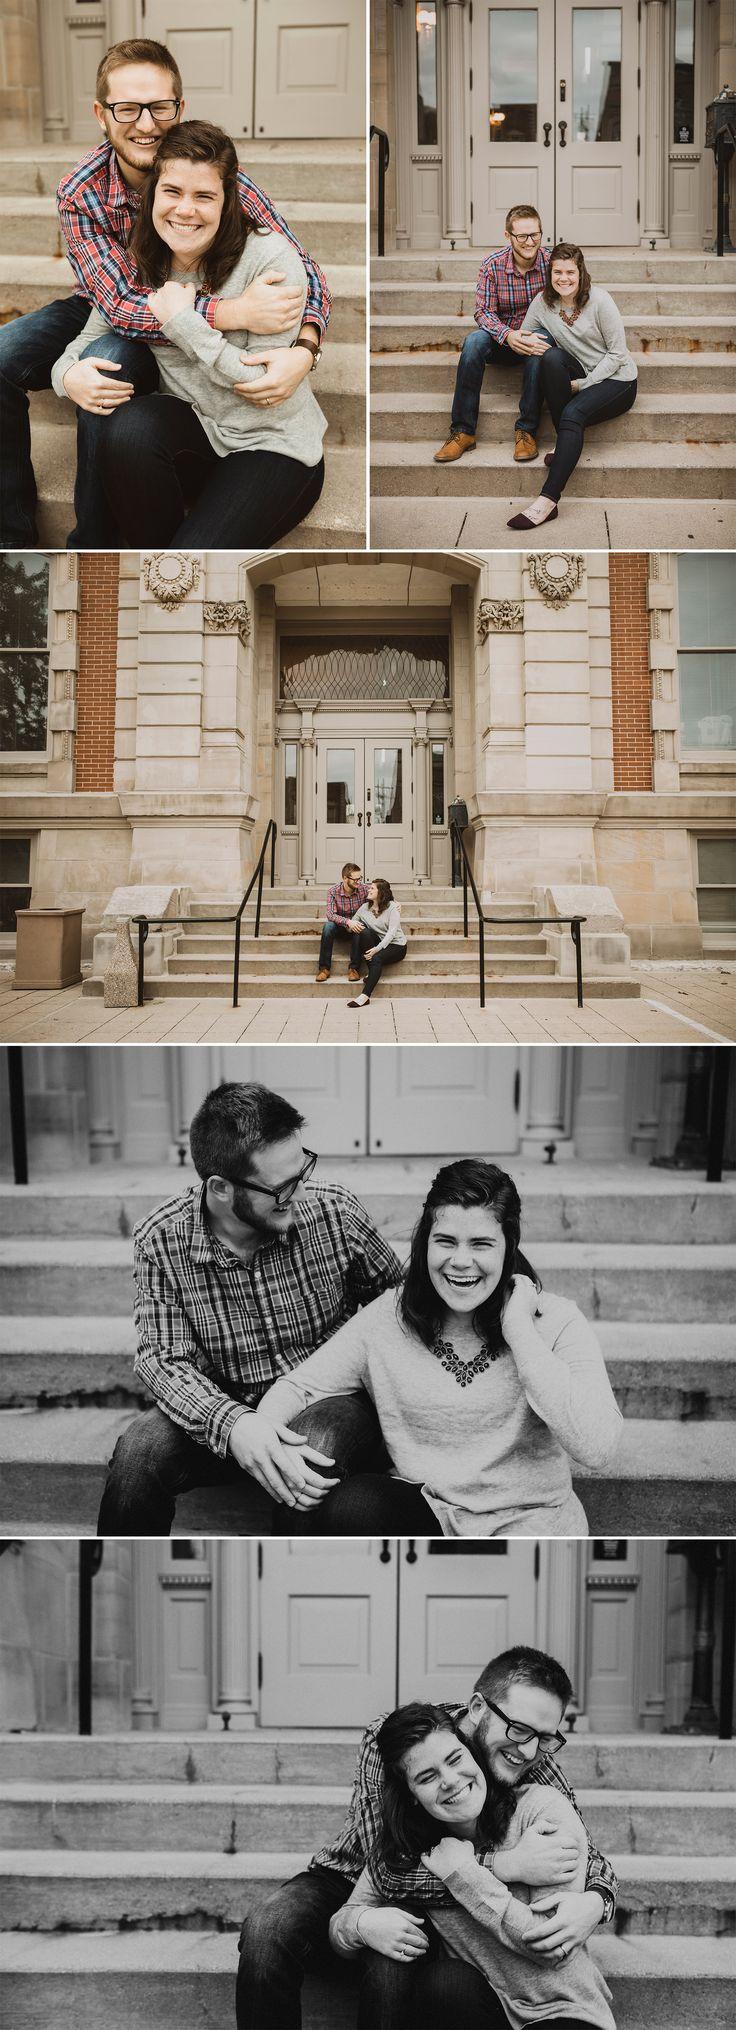 Urban Lifestyle Couples Photo Session // Fishers, Indiana Natural Light Portrait Photographer // Caitlin Tyner Photography #love #walks #neighborhood …